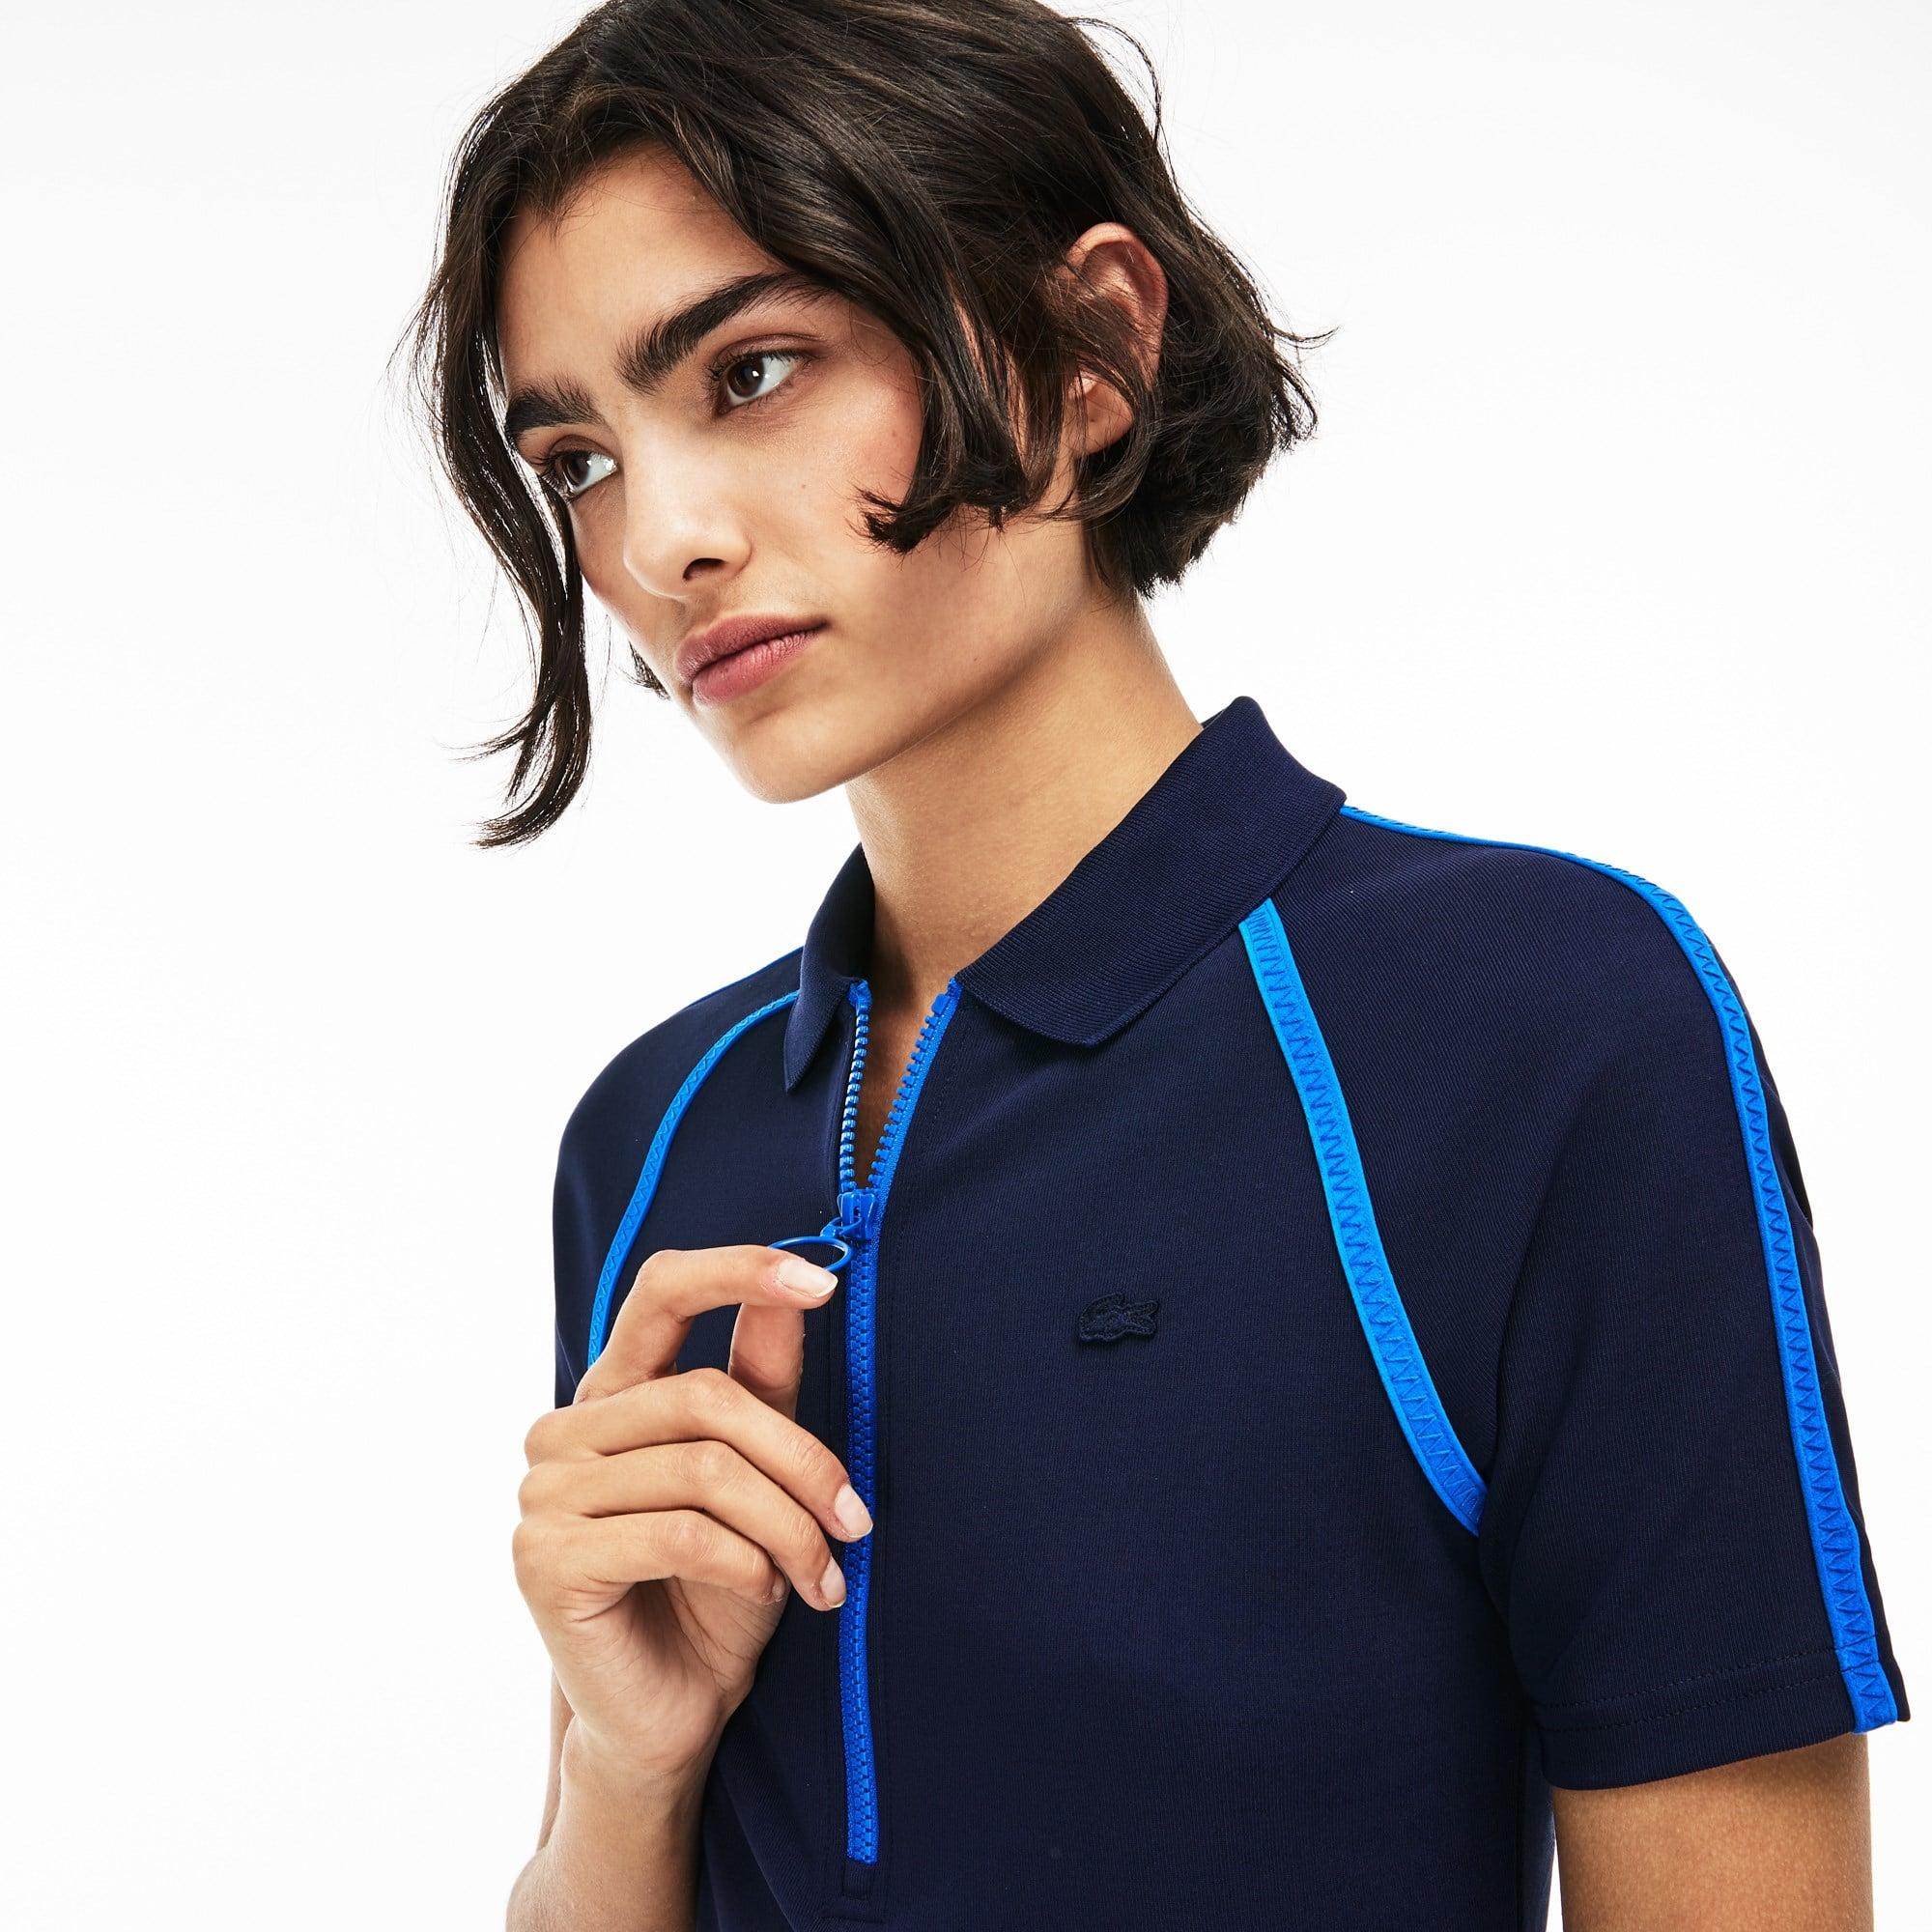 93074037ee8 Women s Lacoste LIVE Zip Polo Shirt Collar Contrast Bands Dress